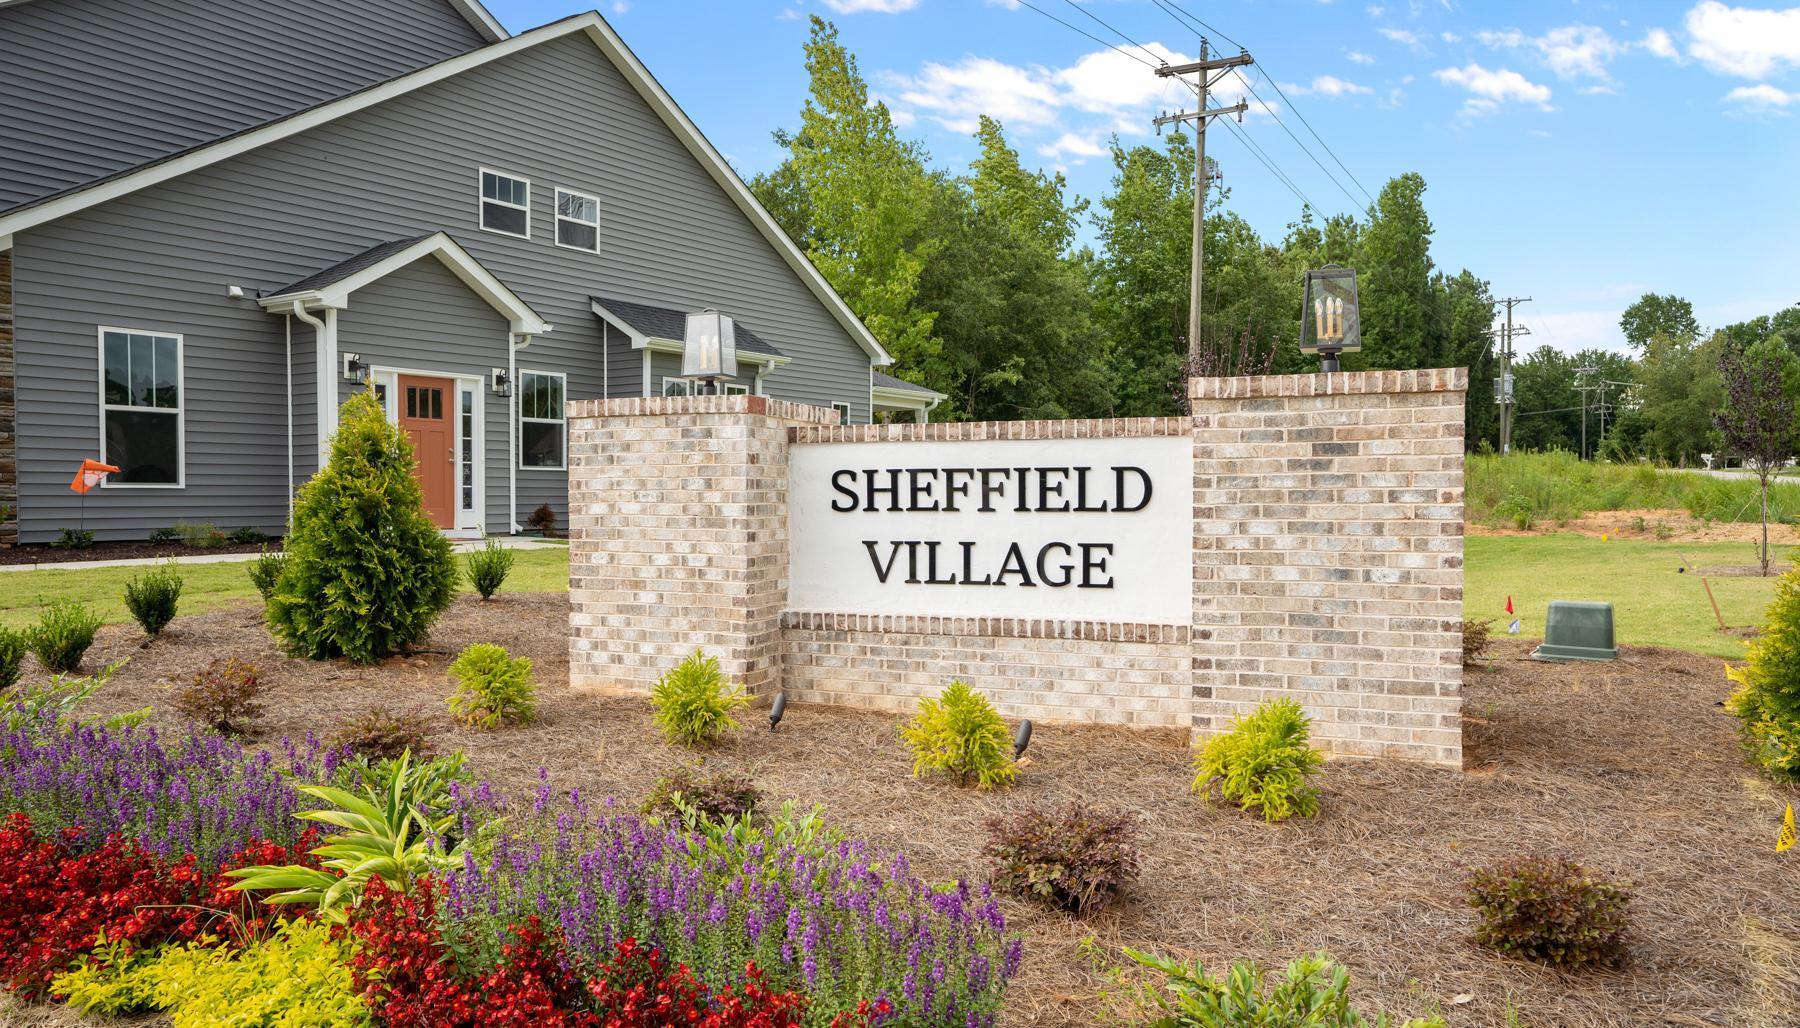 'Sheffield Village' by Dan Ryan - Greenville Region in Greenville-Spartanburg